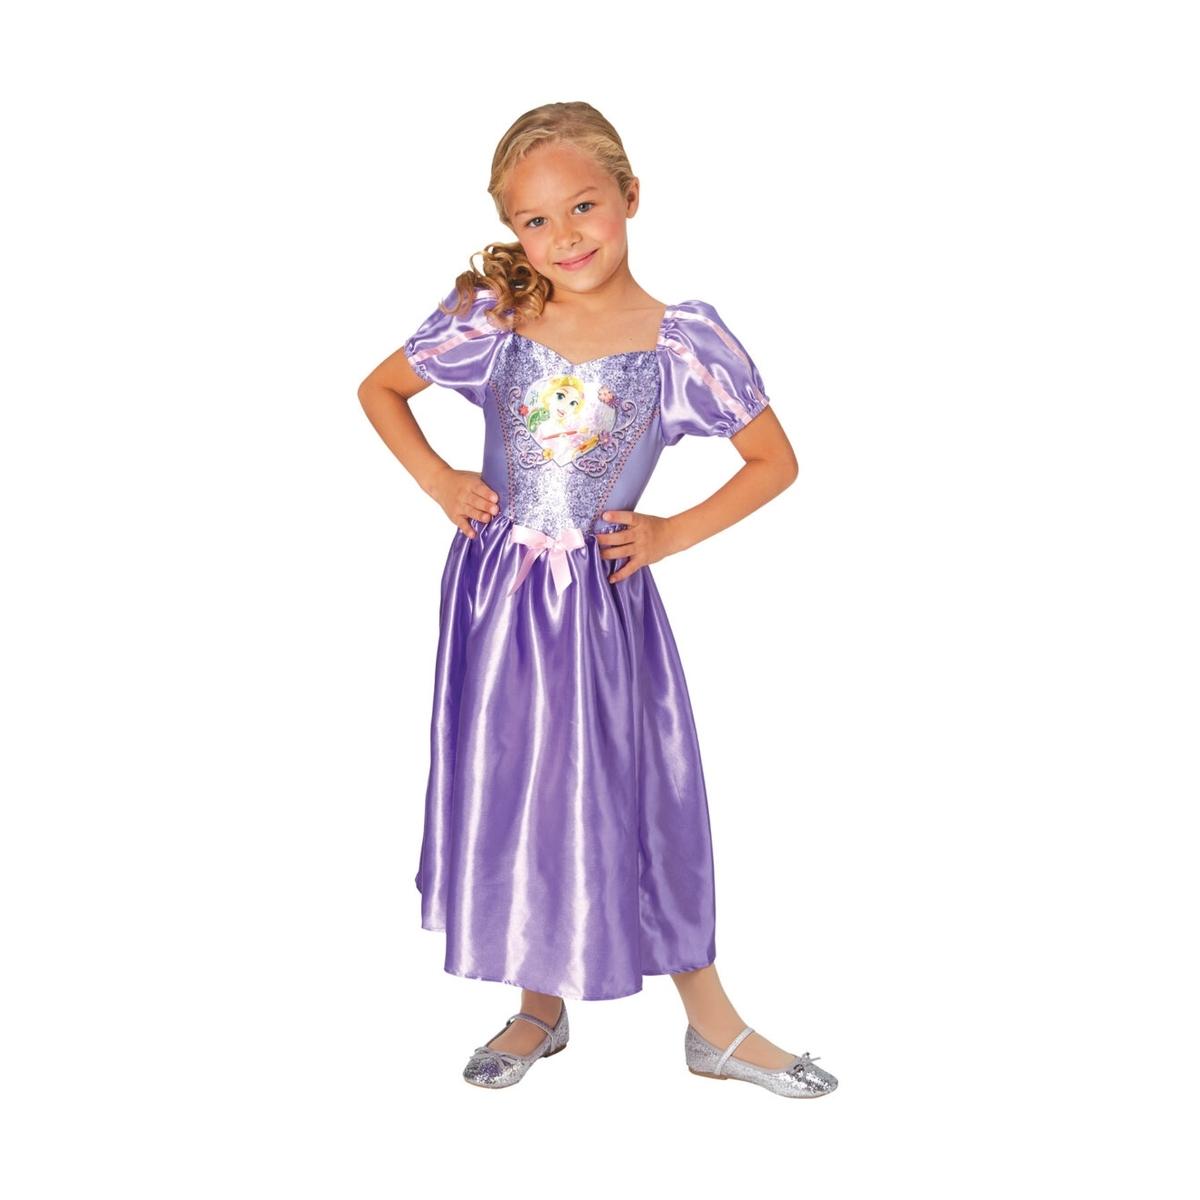 Rapunzel Costume Ages 4 6 Kmart